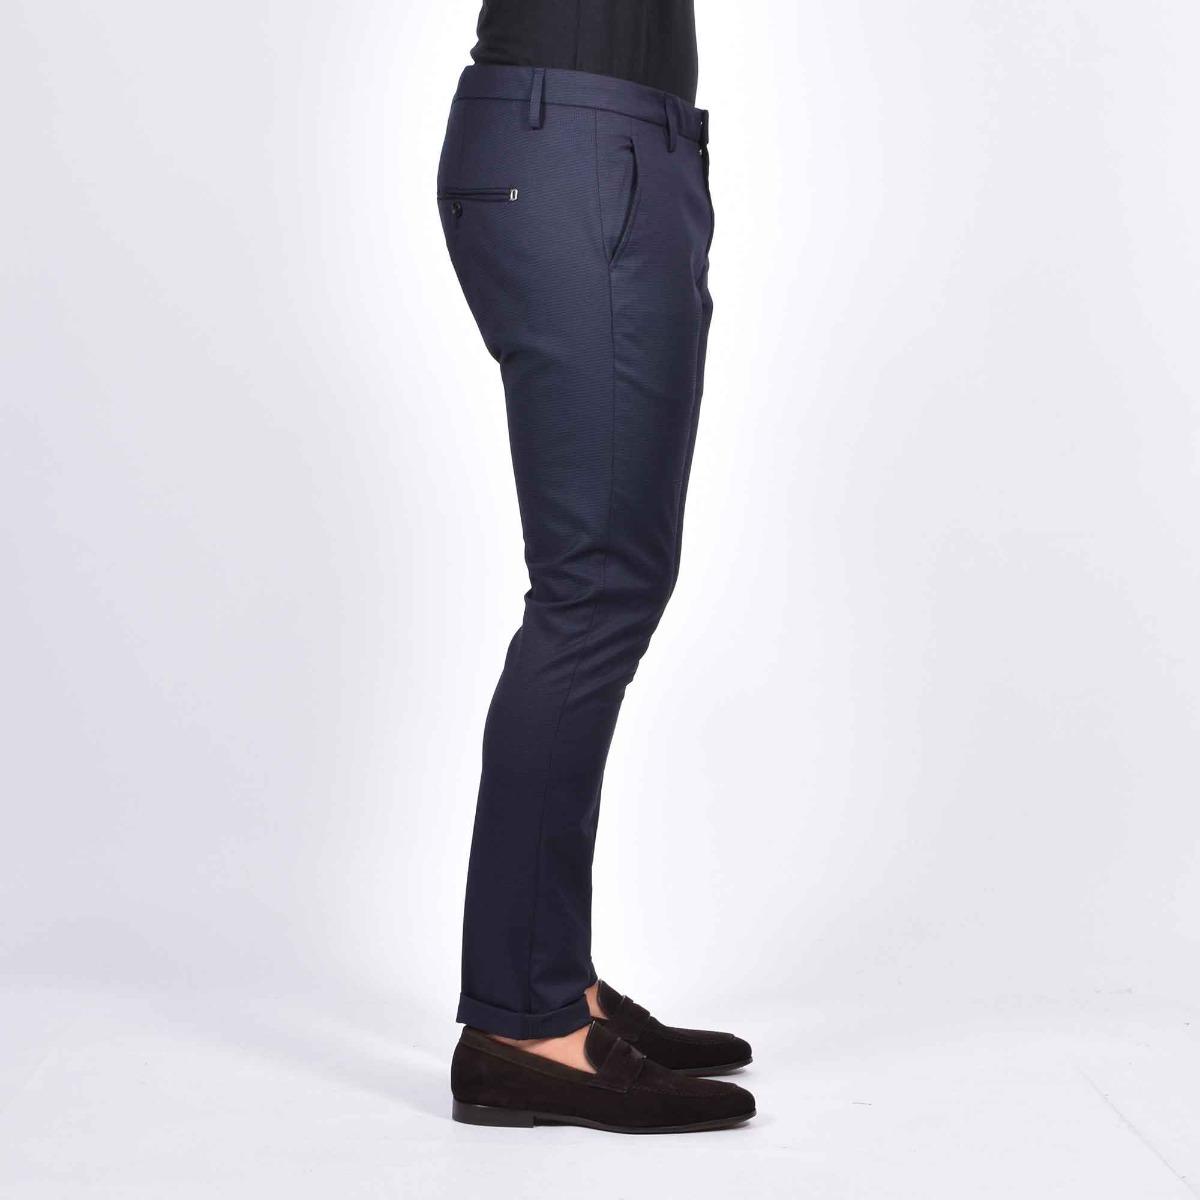 Pantalone gaubert micro pied de poule - Blu/nero